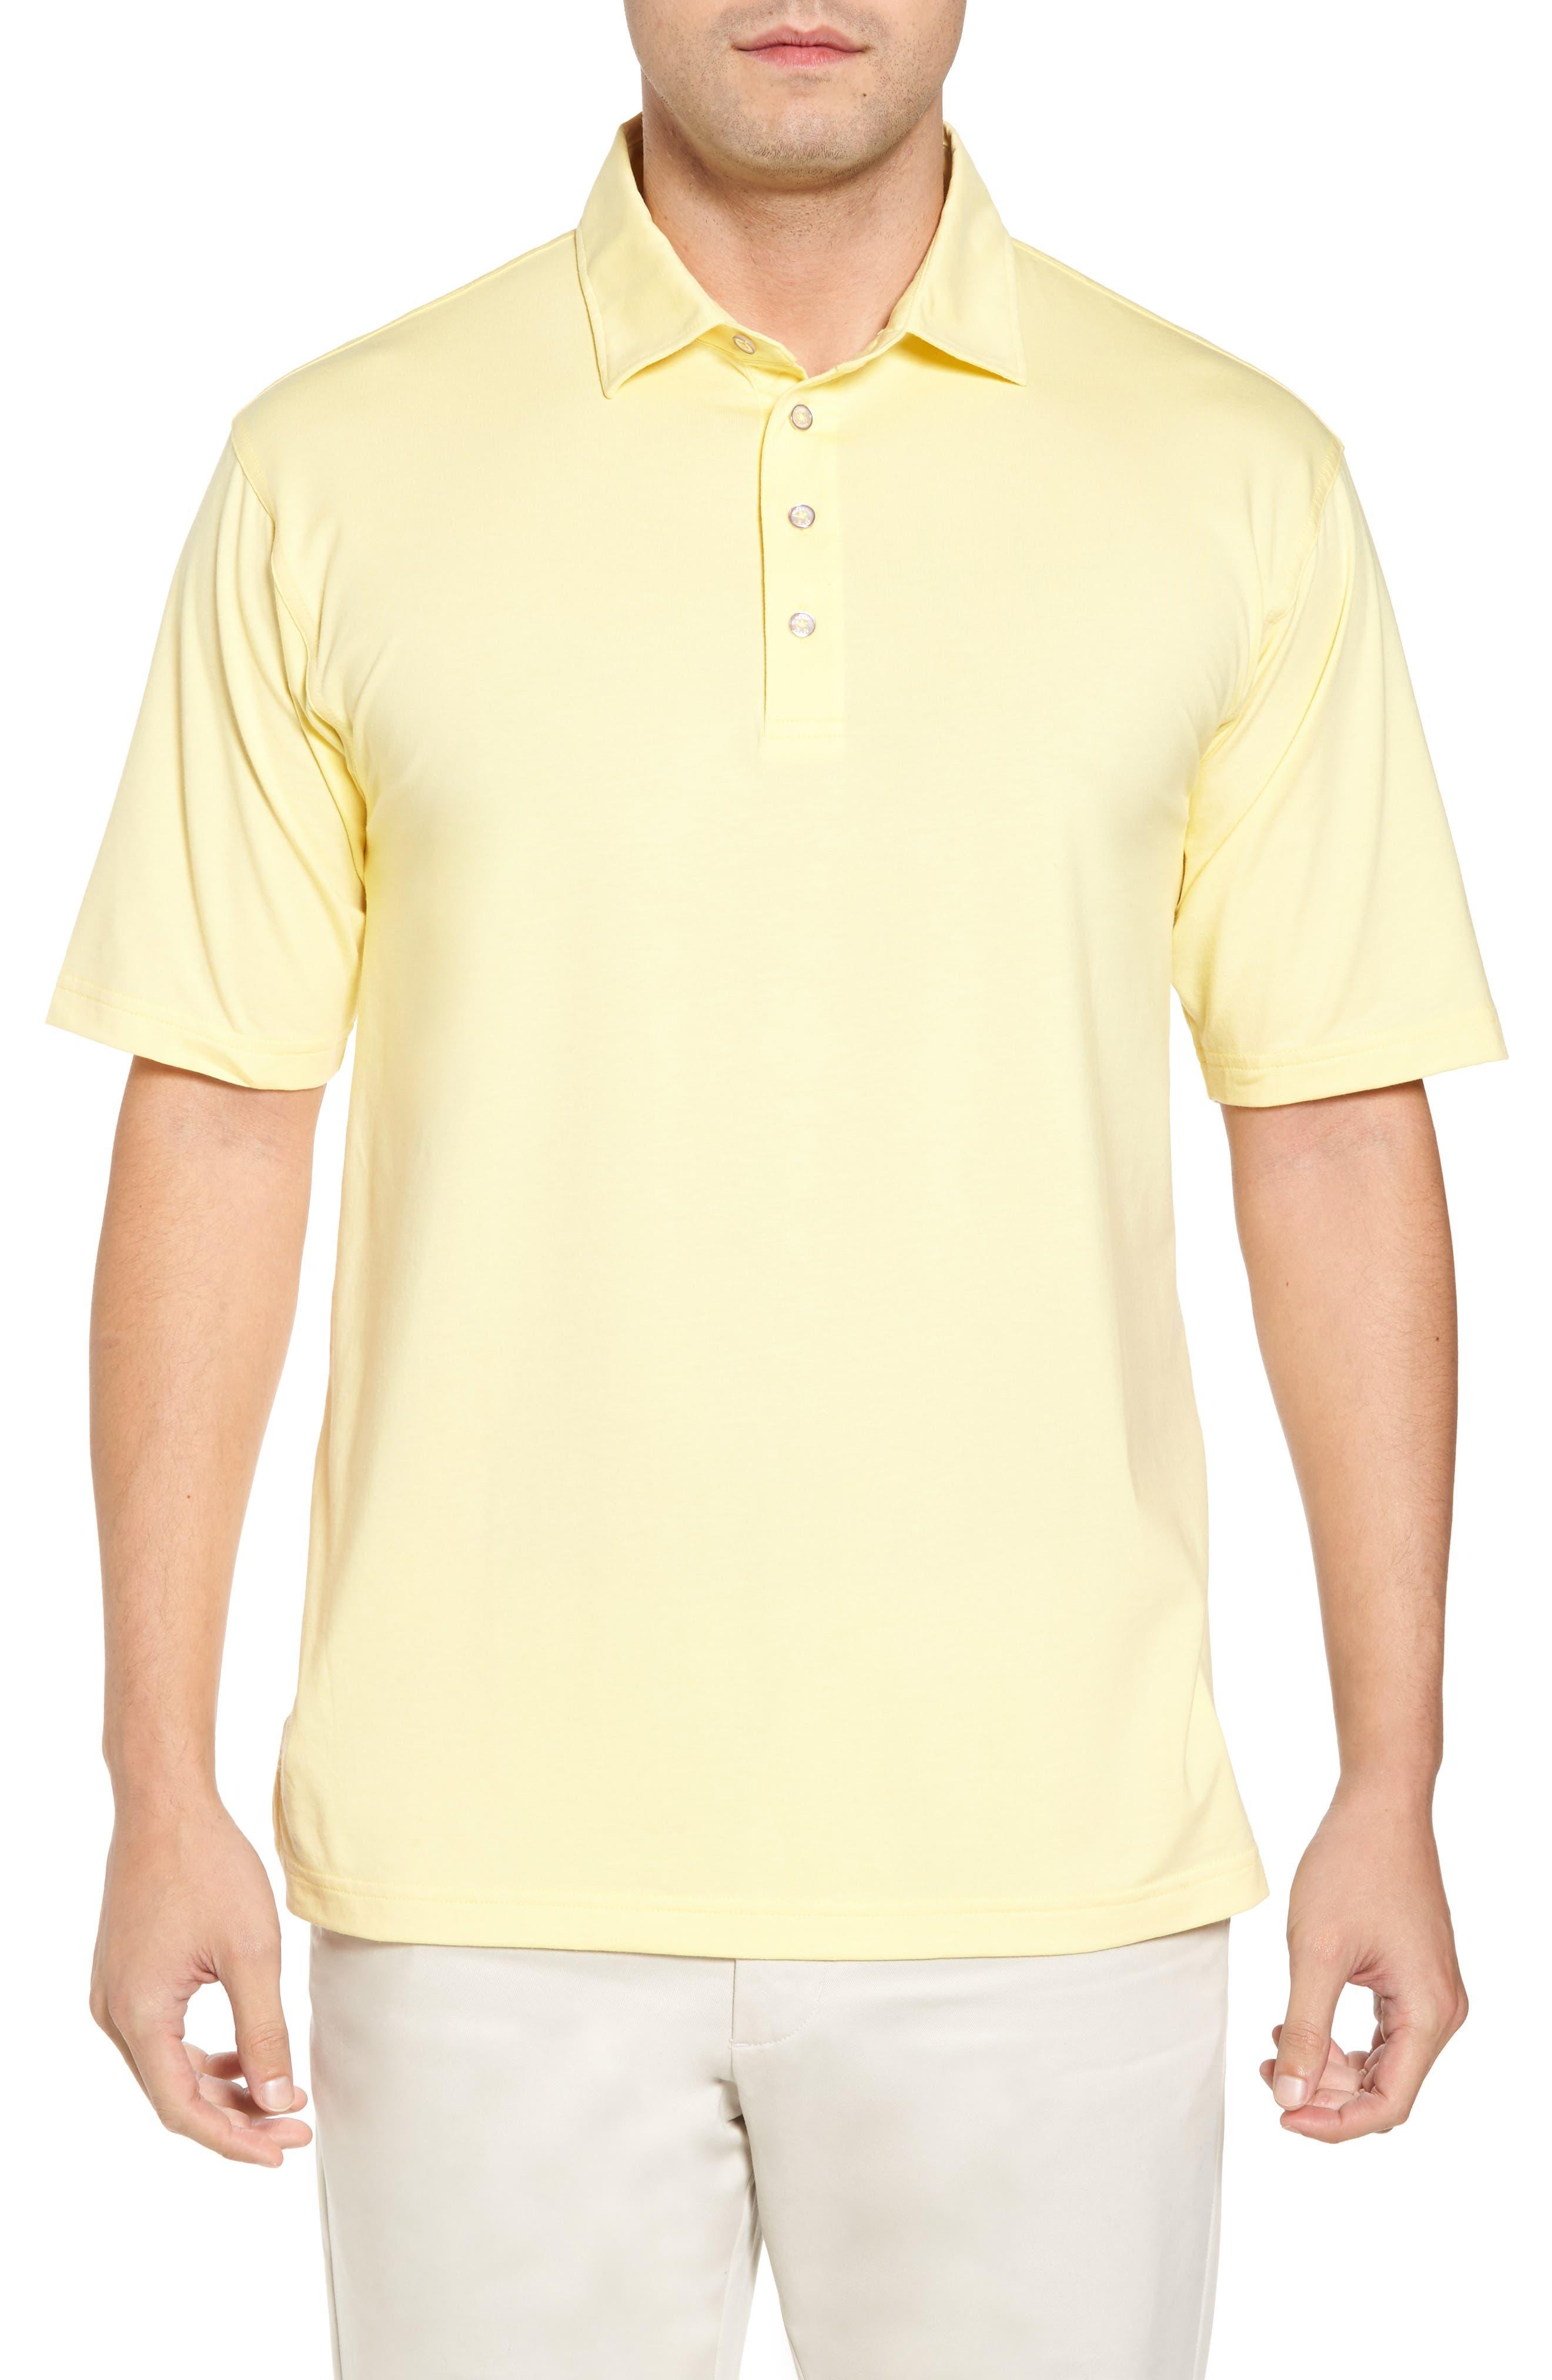 Bobby Jones Liquid Cotton Stretch Jersey Polo